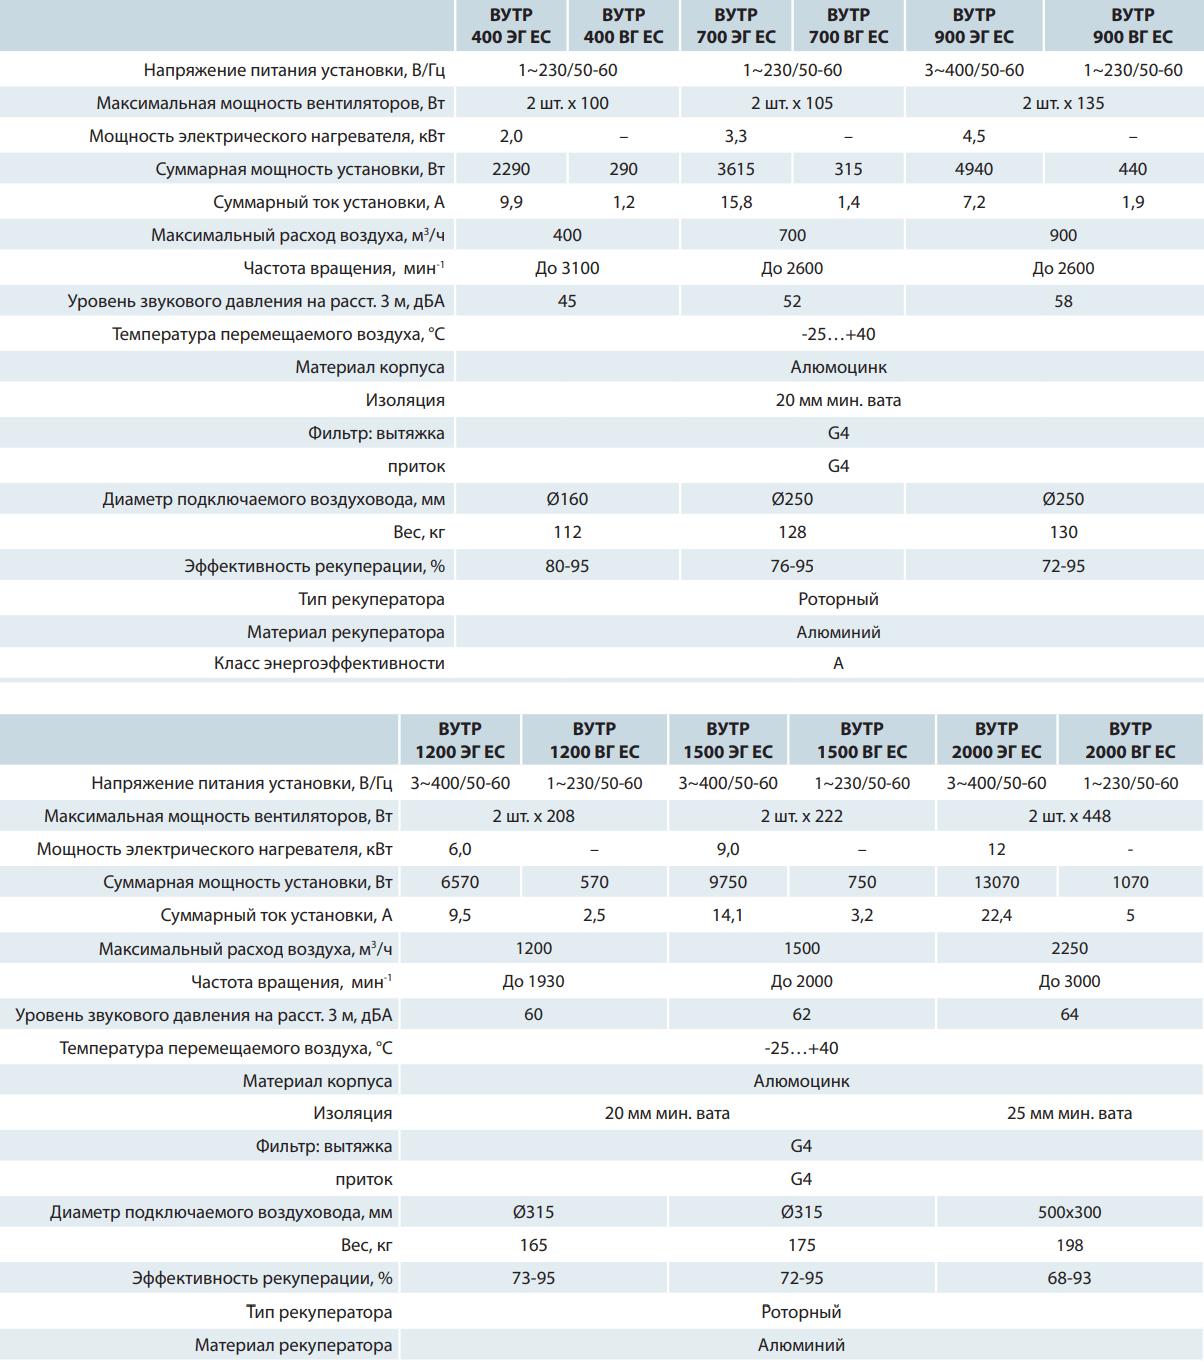 Приточно-вытяжная установка Вентс ВУТР ЭГ/ВГ ЕС - Технические характеристики